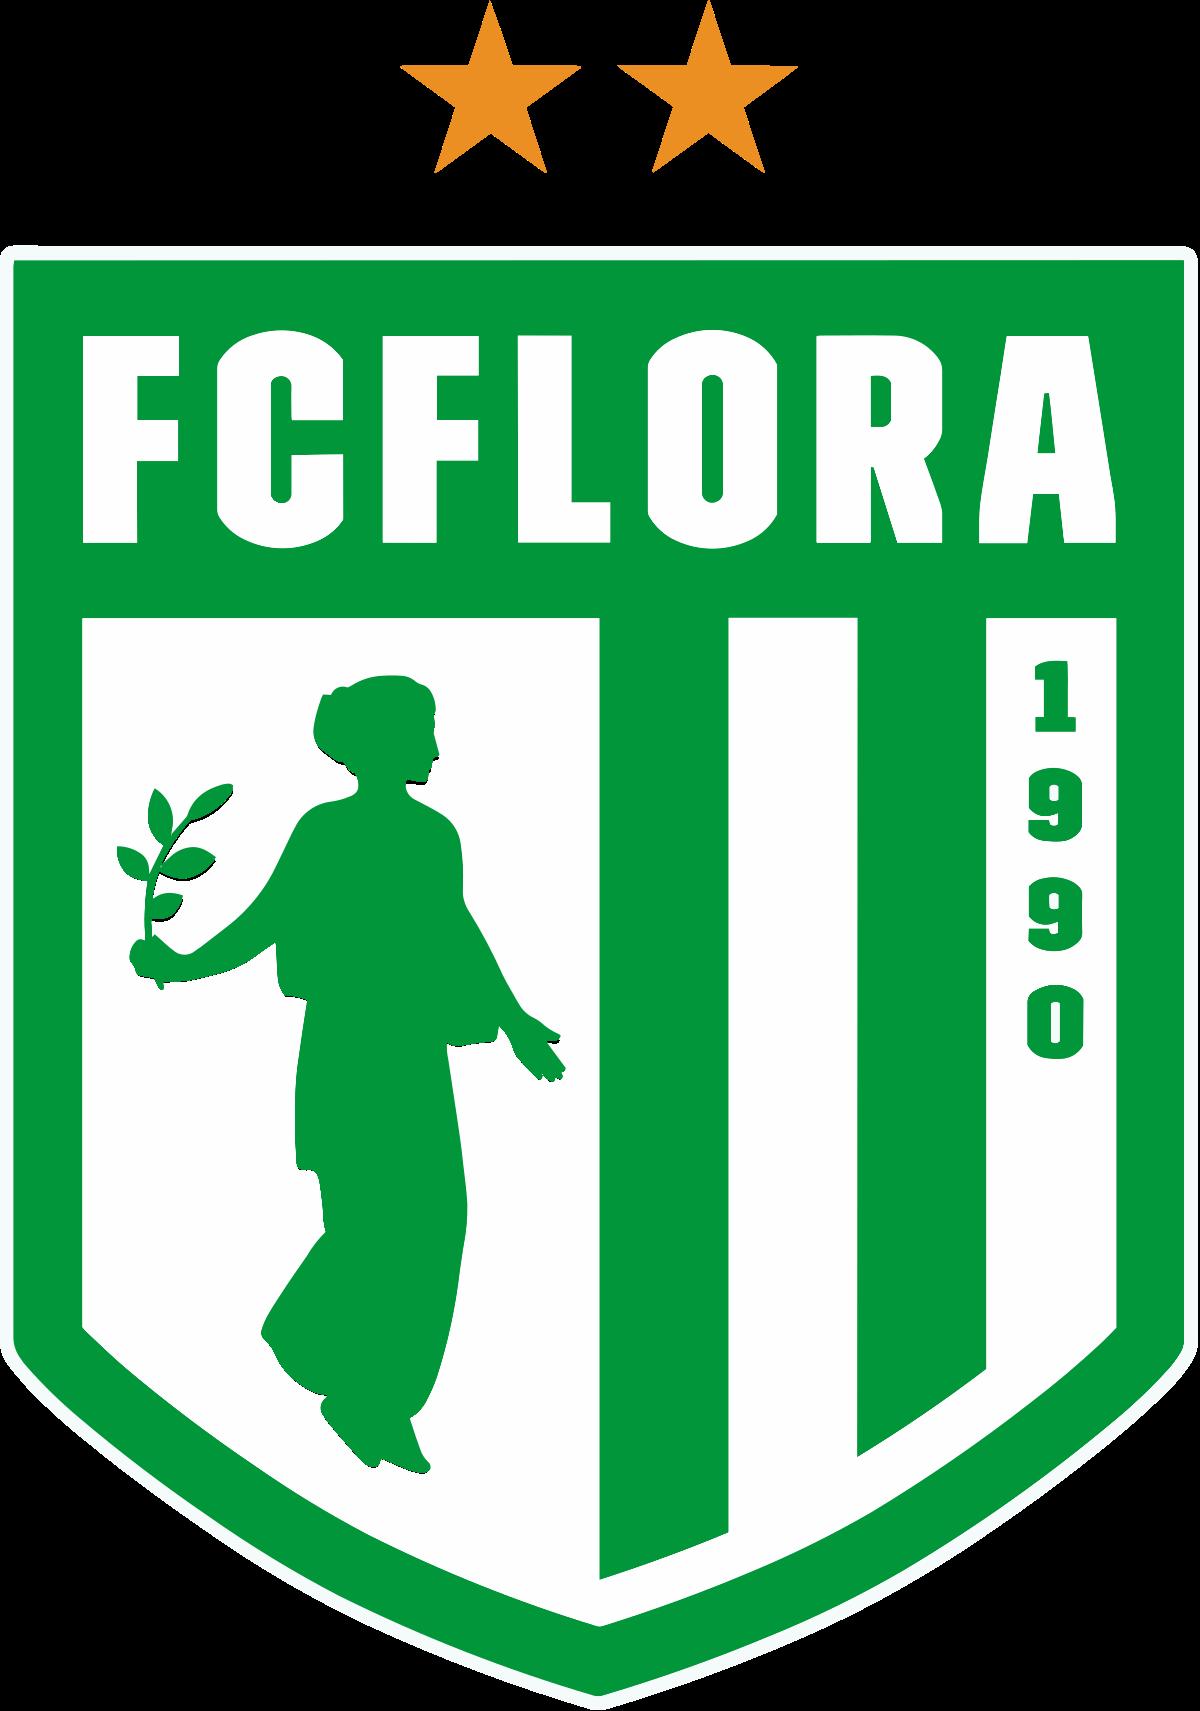 Flora Tallinn team logo